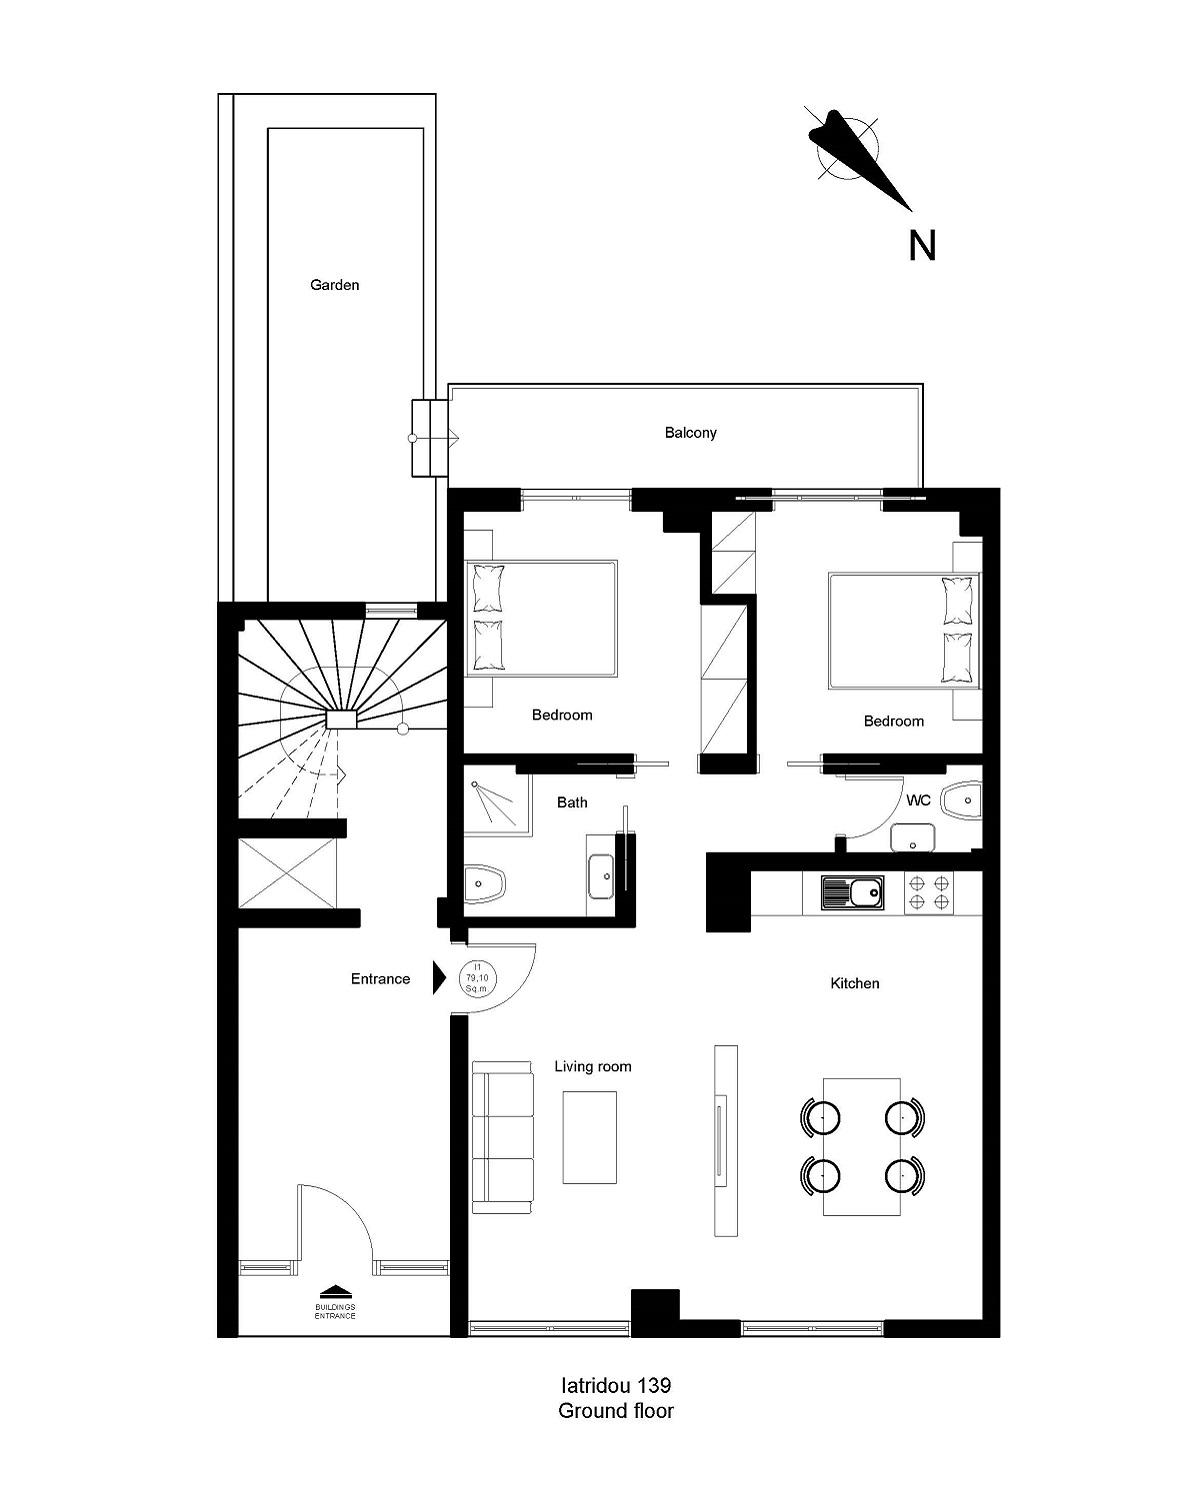 Iatridou 139 ground floor plan